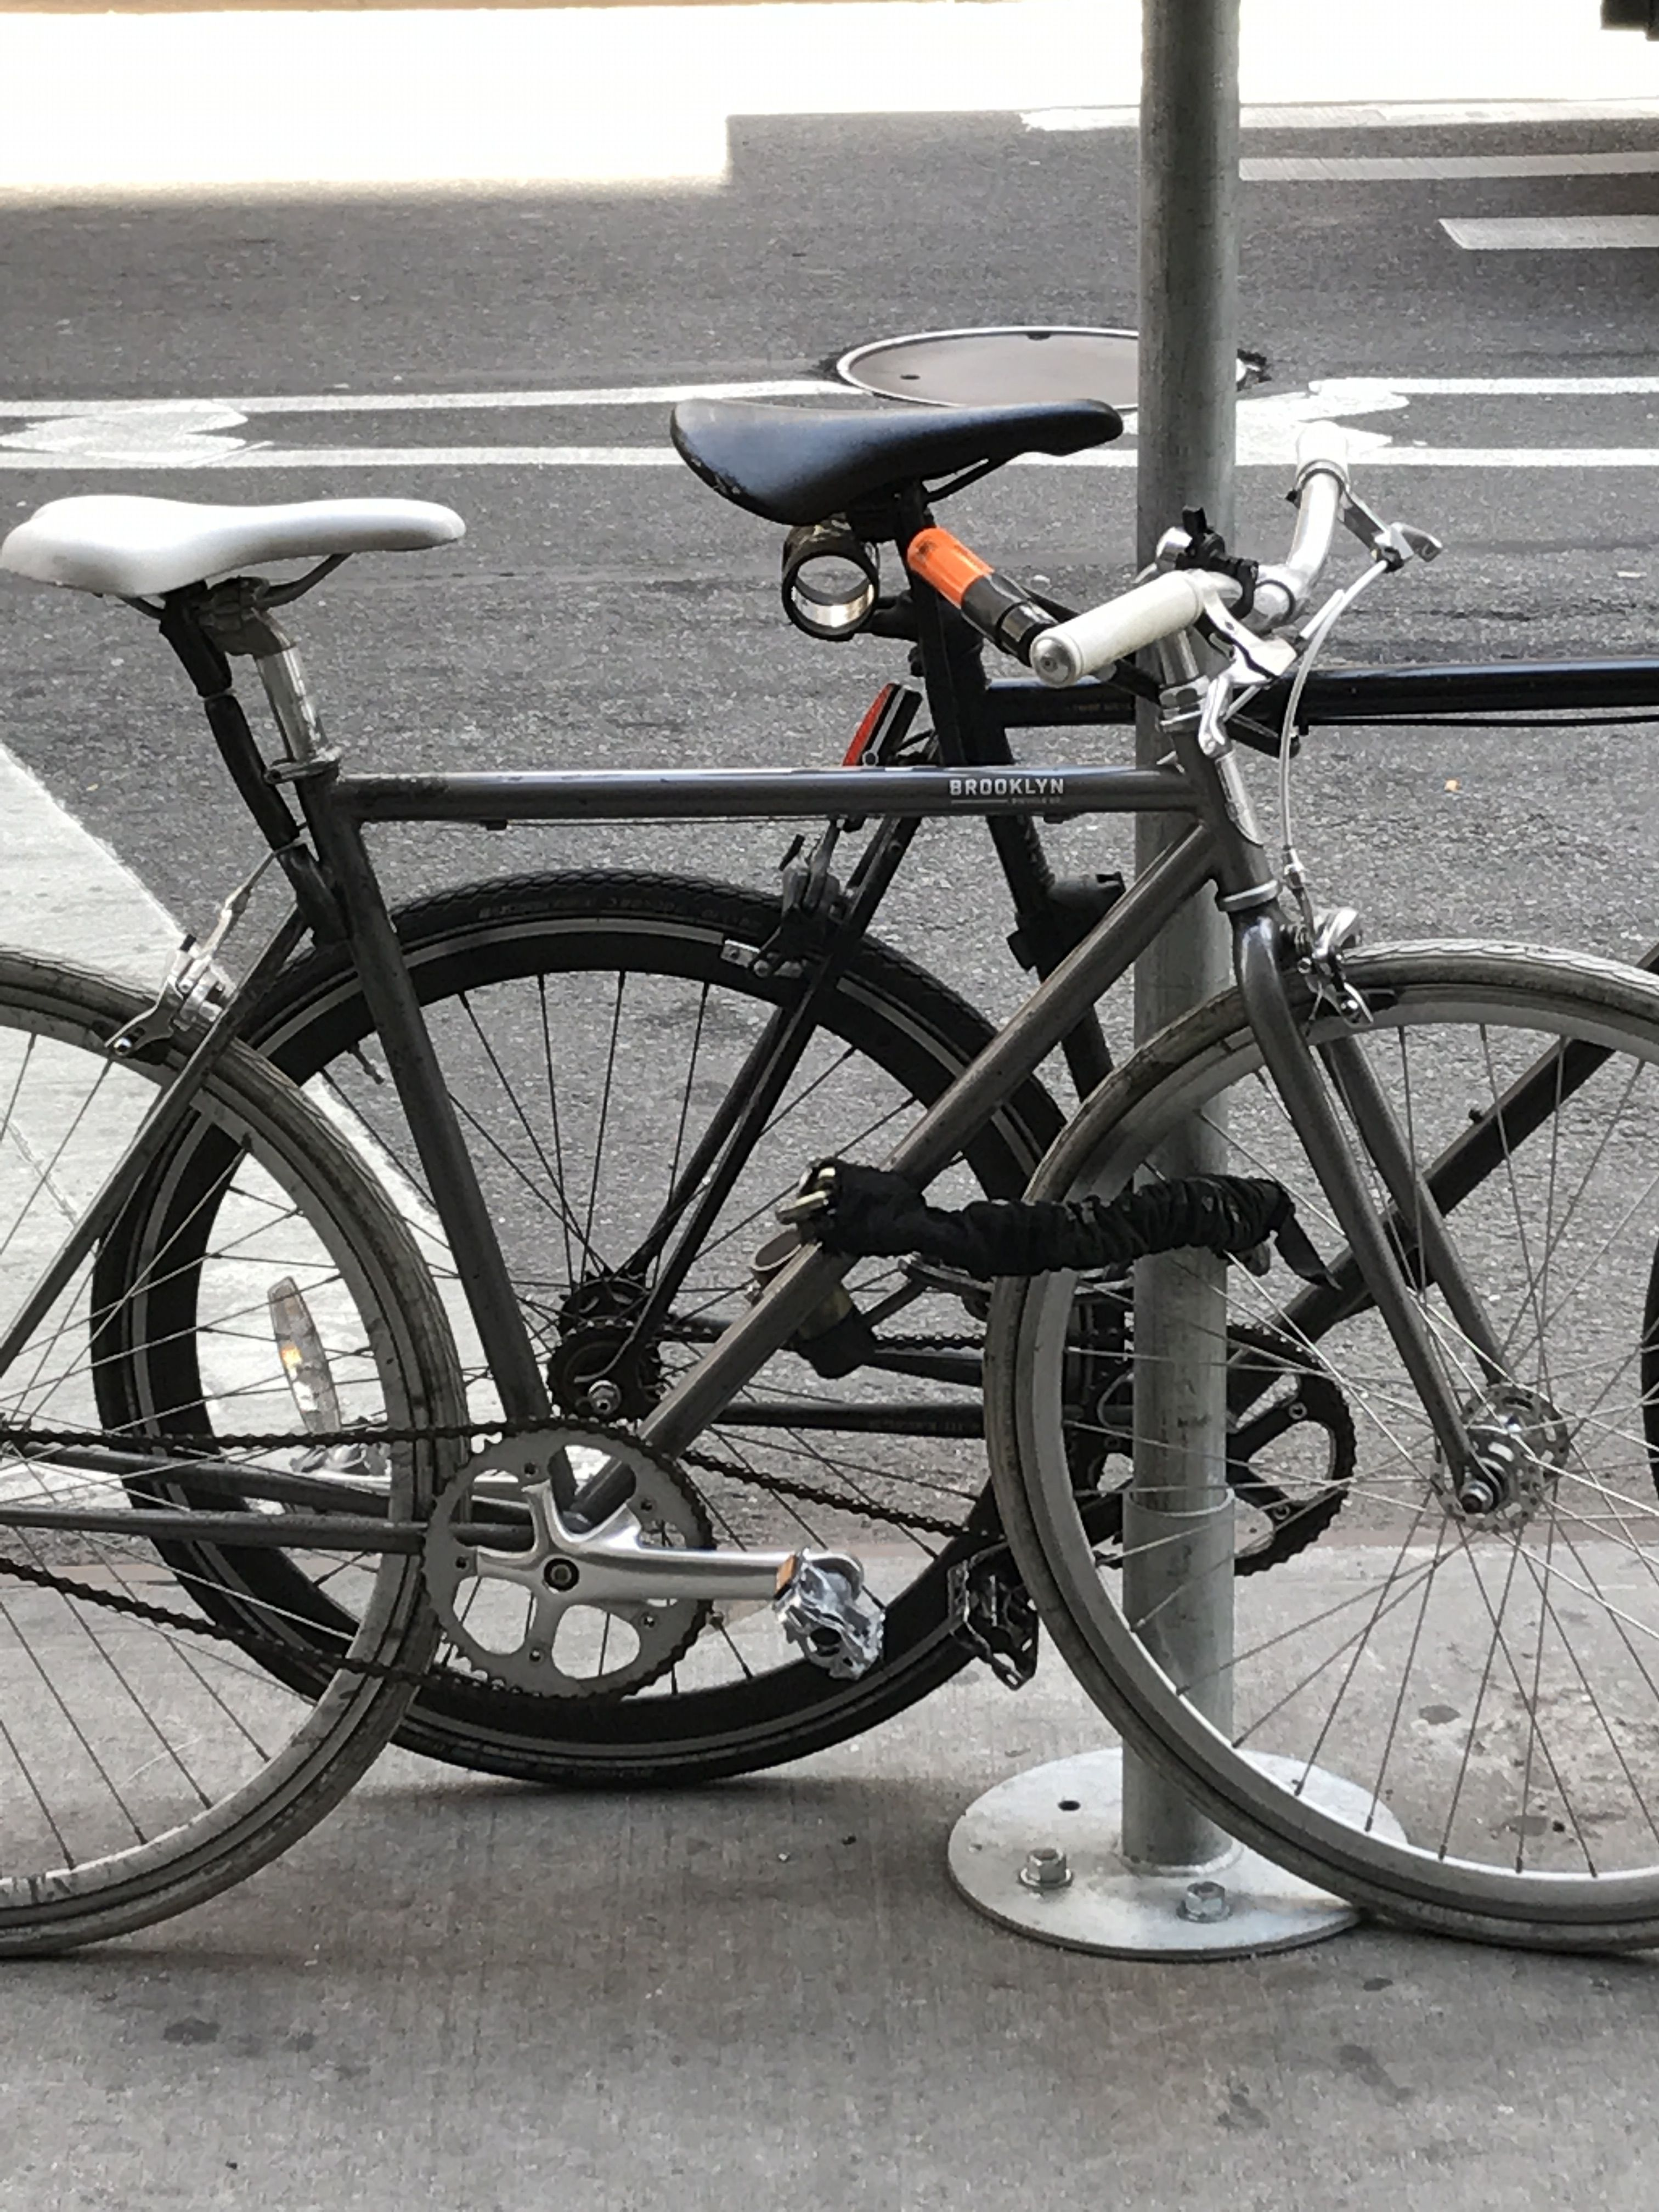 Pin By Javier Lopez Montoya On Bike Bike Bicycle Vehicles